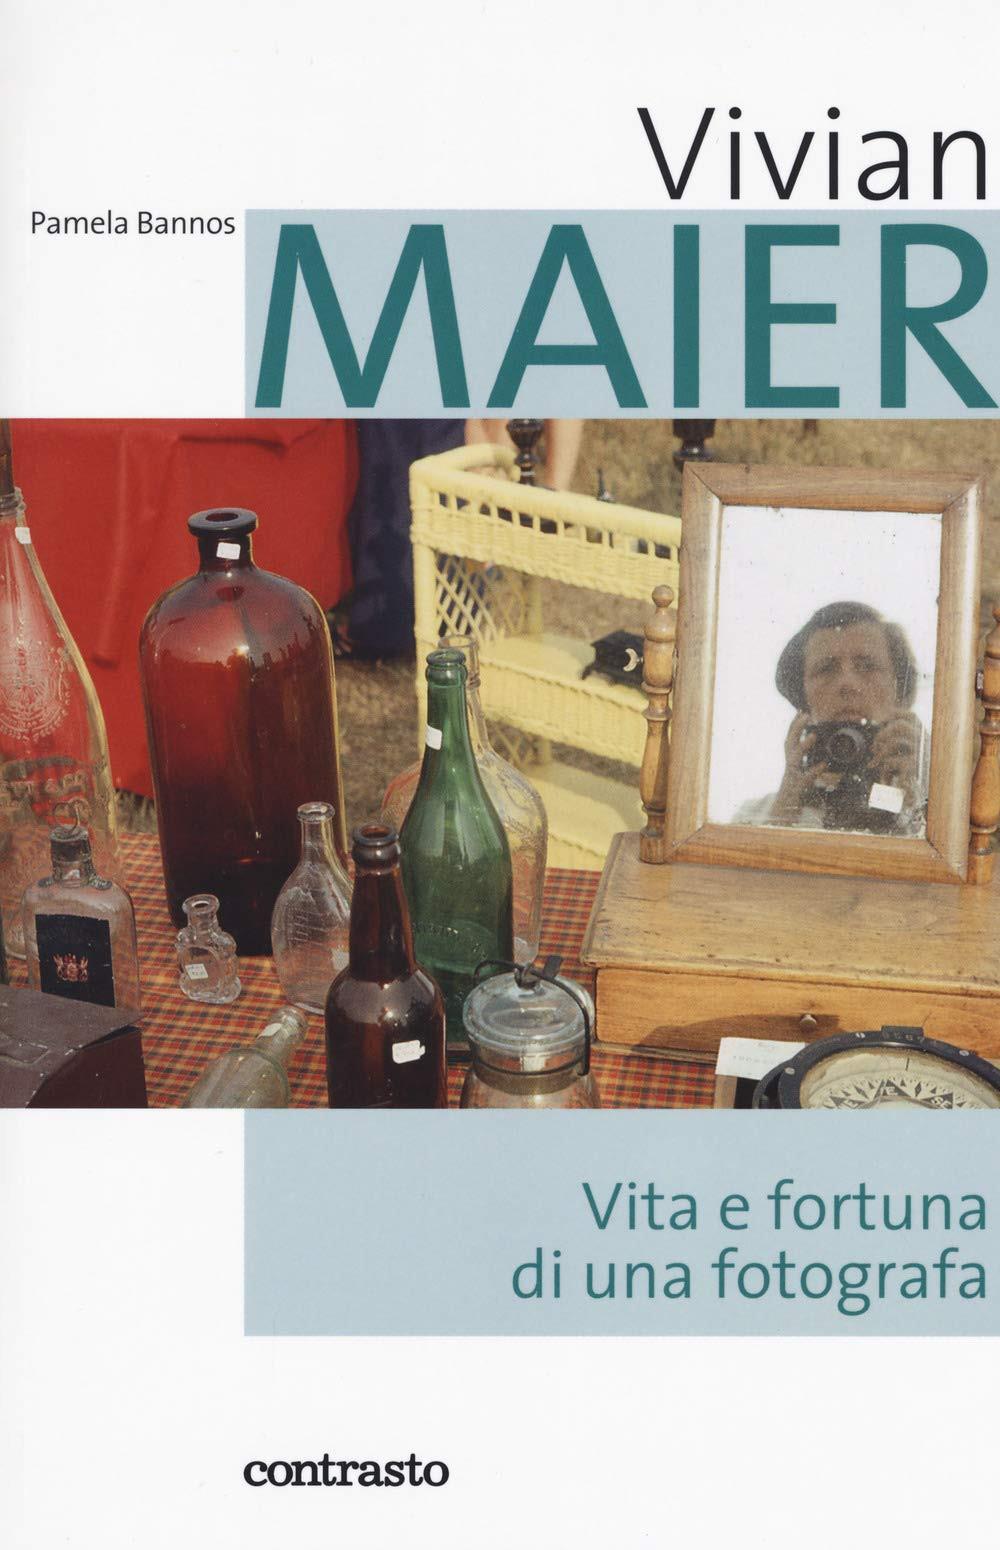 Libro Contrasto Pamela Bannos  Vivian Maier  Vita e fortuna di una fotografa